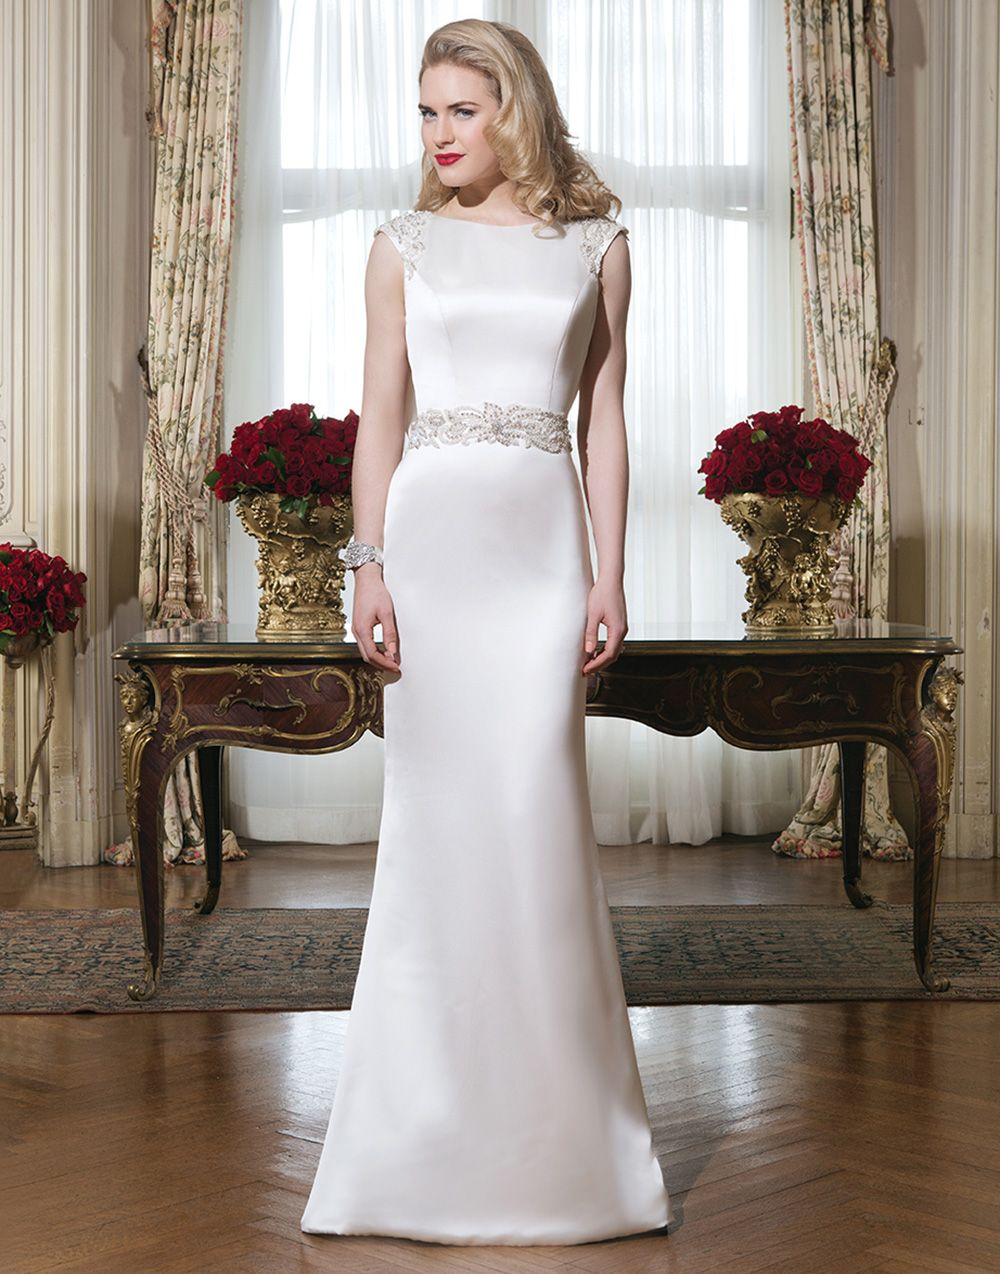 Justin Alexander Wedding Dress Giveaway - Sponsored Post | Bekleidung